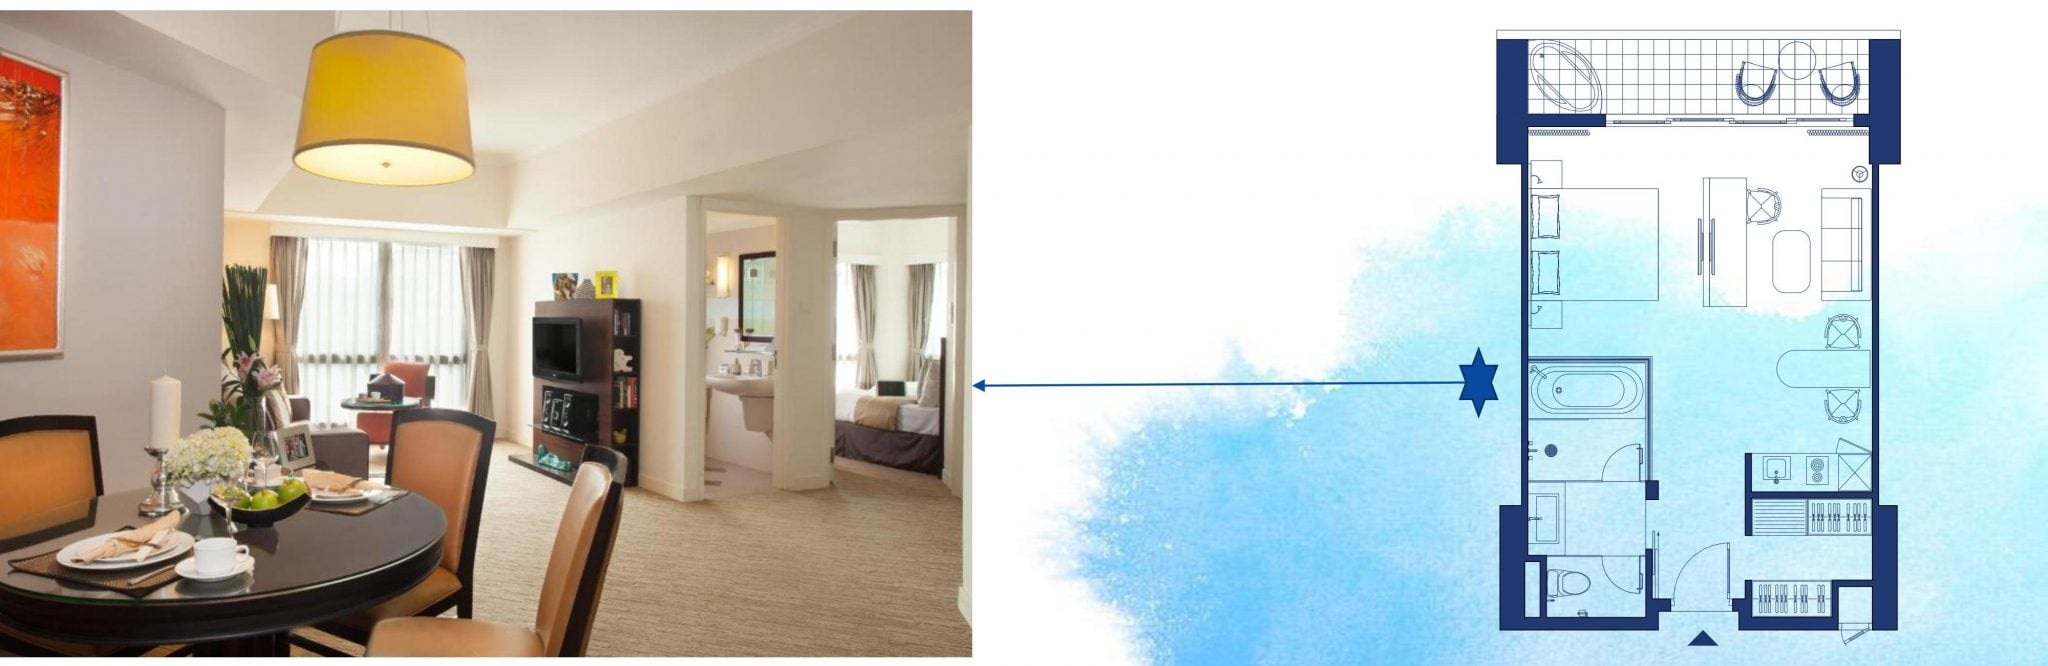 0043 e1563265352565 - Dự án căn hộ condotel Cam Ranh Bay - Pearl Cam Ranh